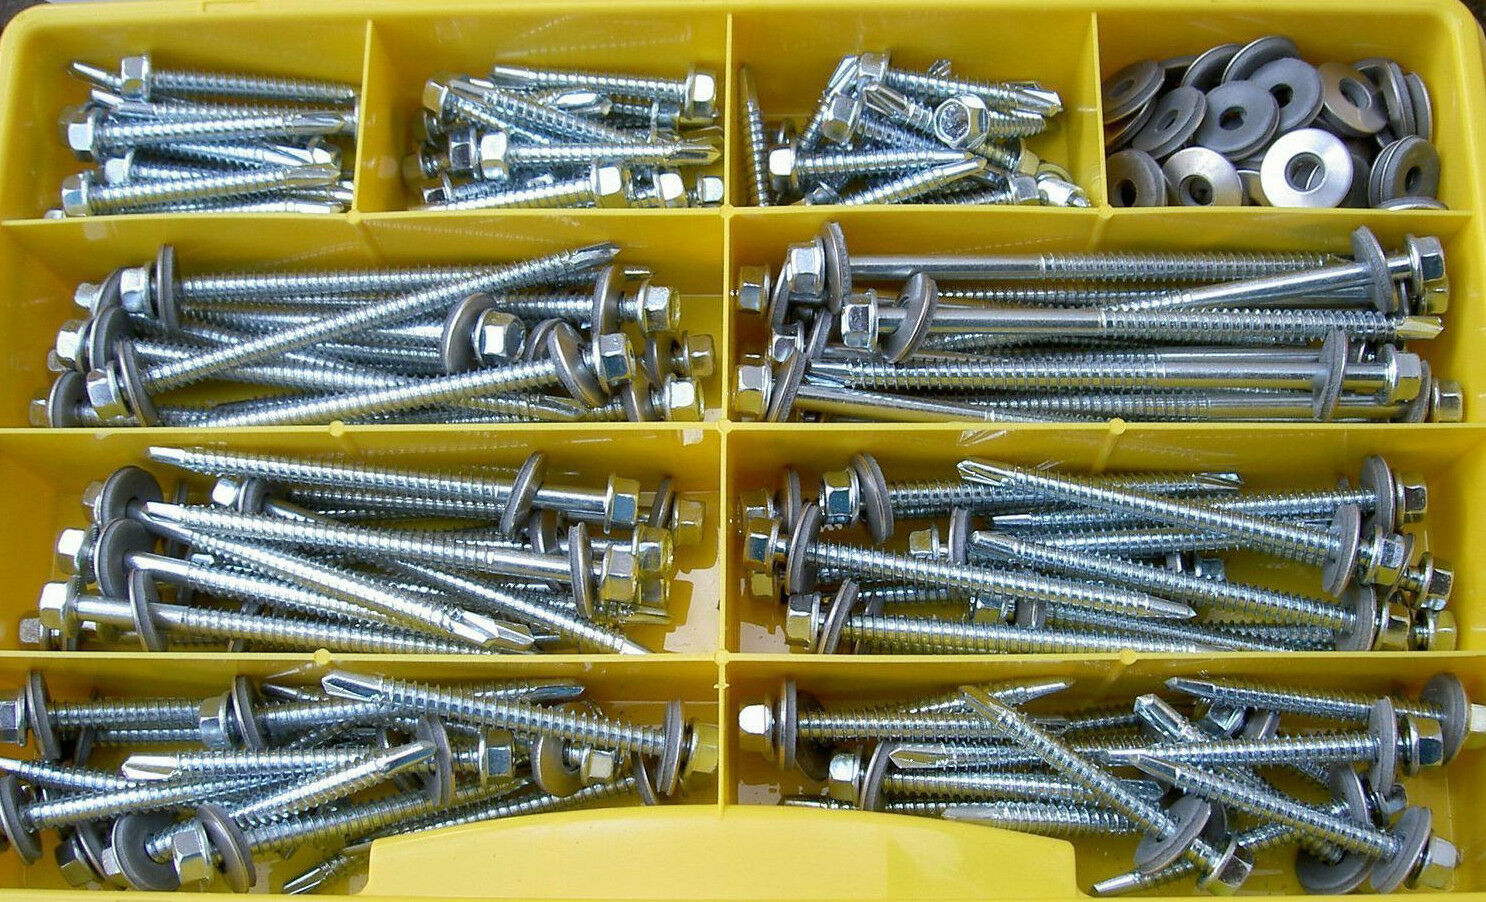 150 Teile Bohrschrauben Sortiment Box Din 7504 K Epdm Dichtscheiben V2A